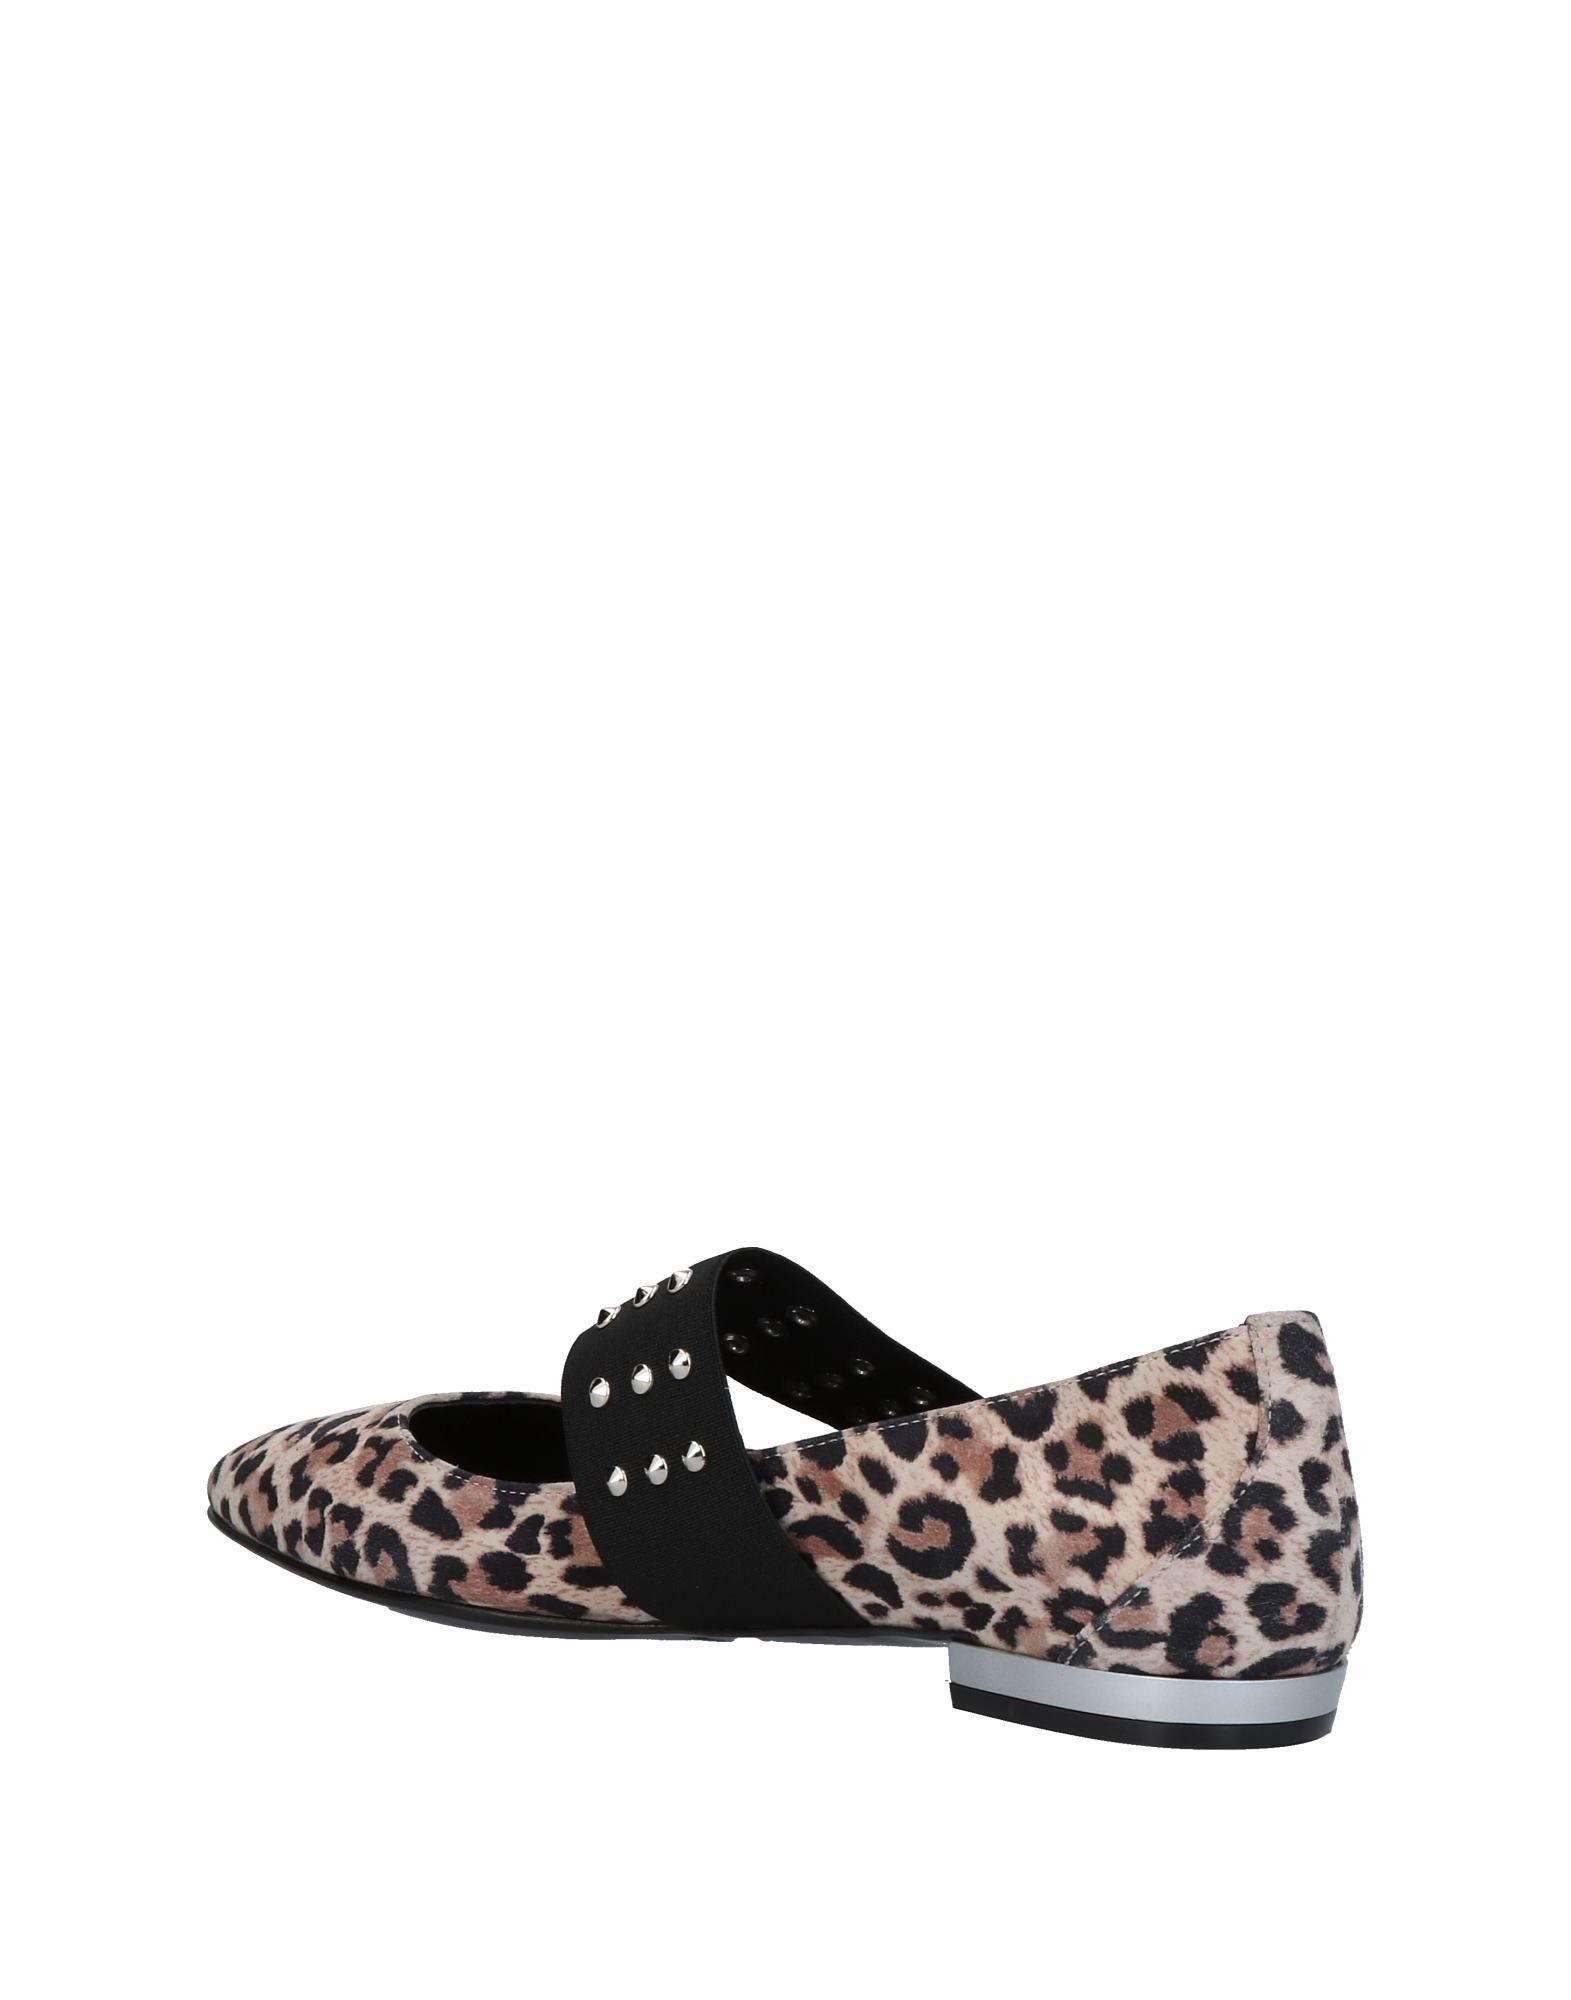 Emanuela Emanuela Emanuela Passeri Ballerinas Damen  11444661MH Gute Qualität beliebte Schuhe c37014